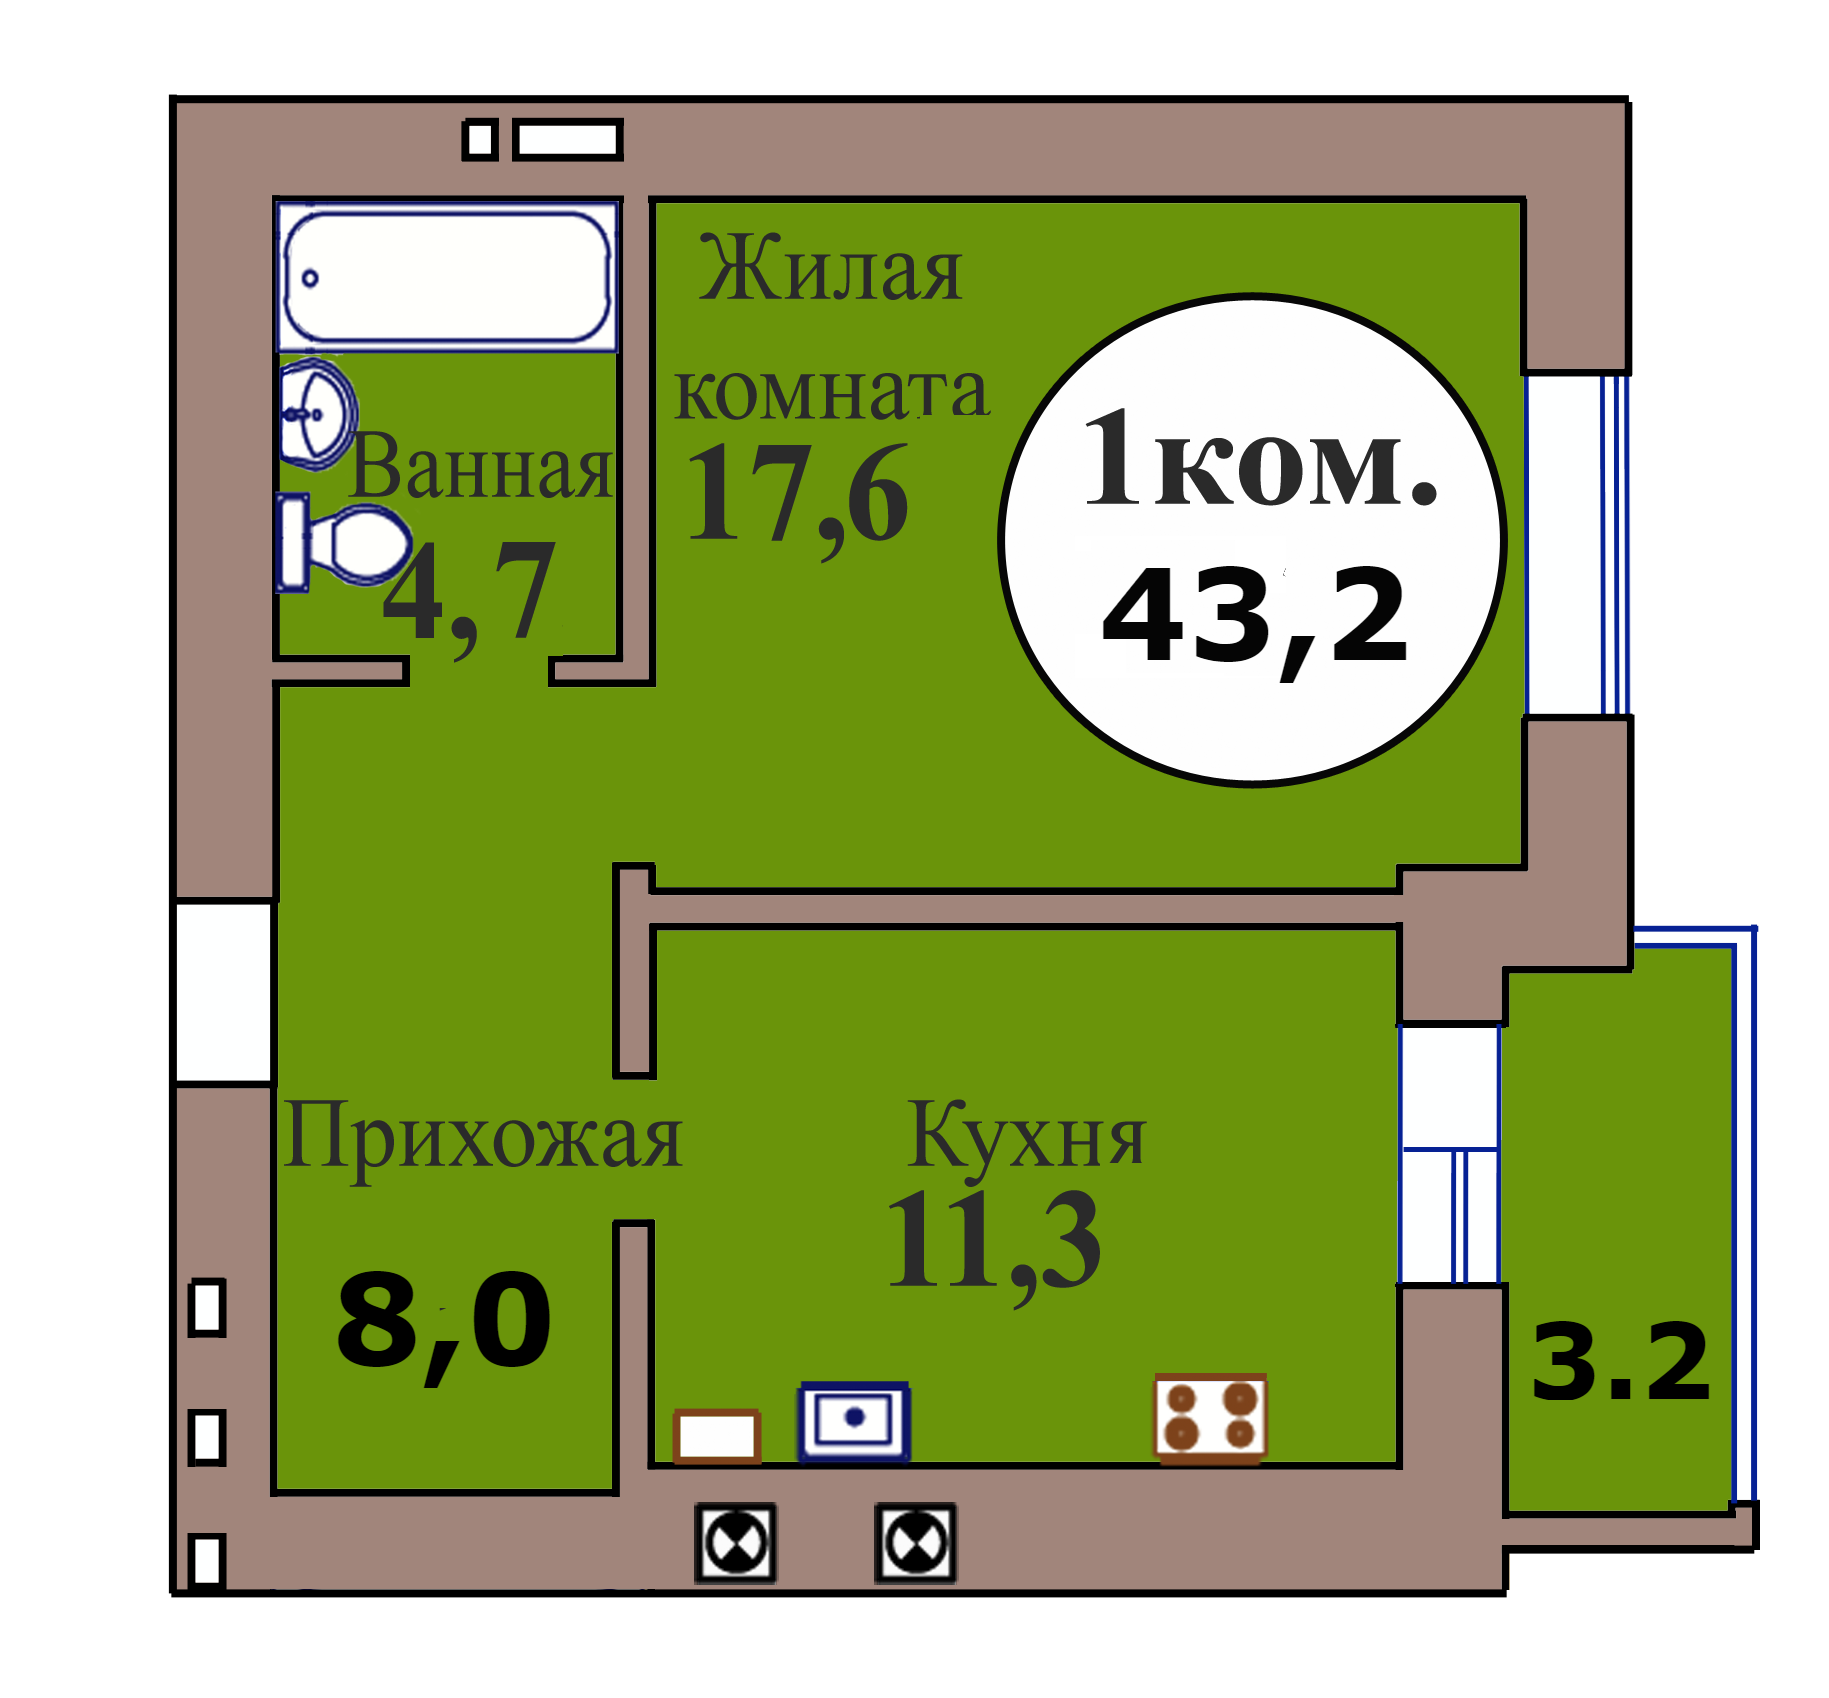 1-комн. кв. по ГП дом №3, МКР Васильково, кв. 147 в Калининграде